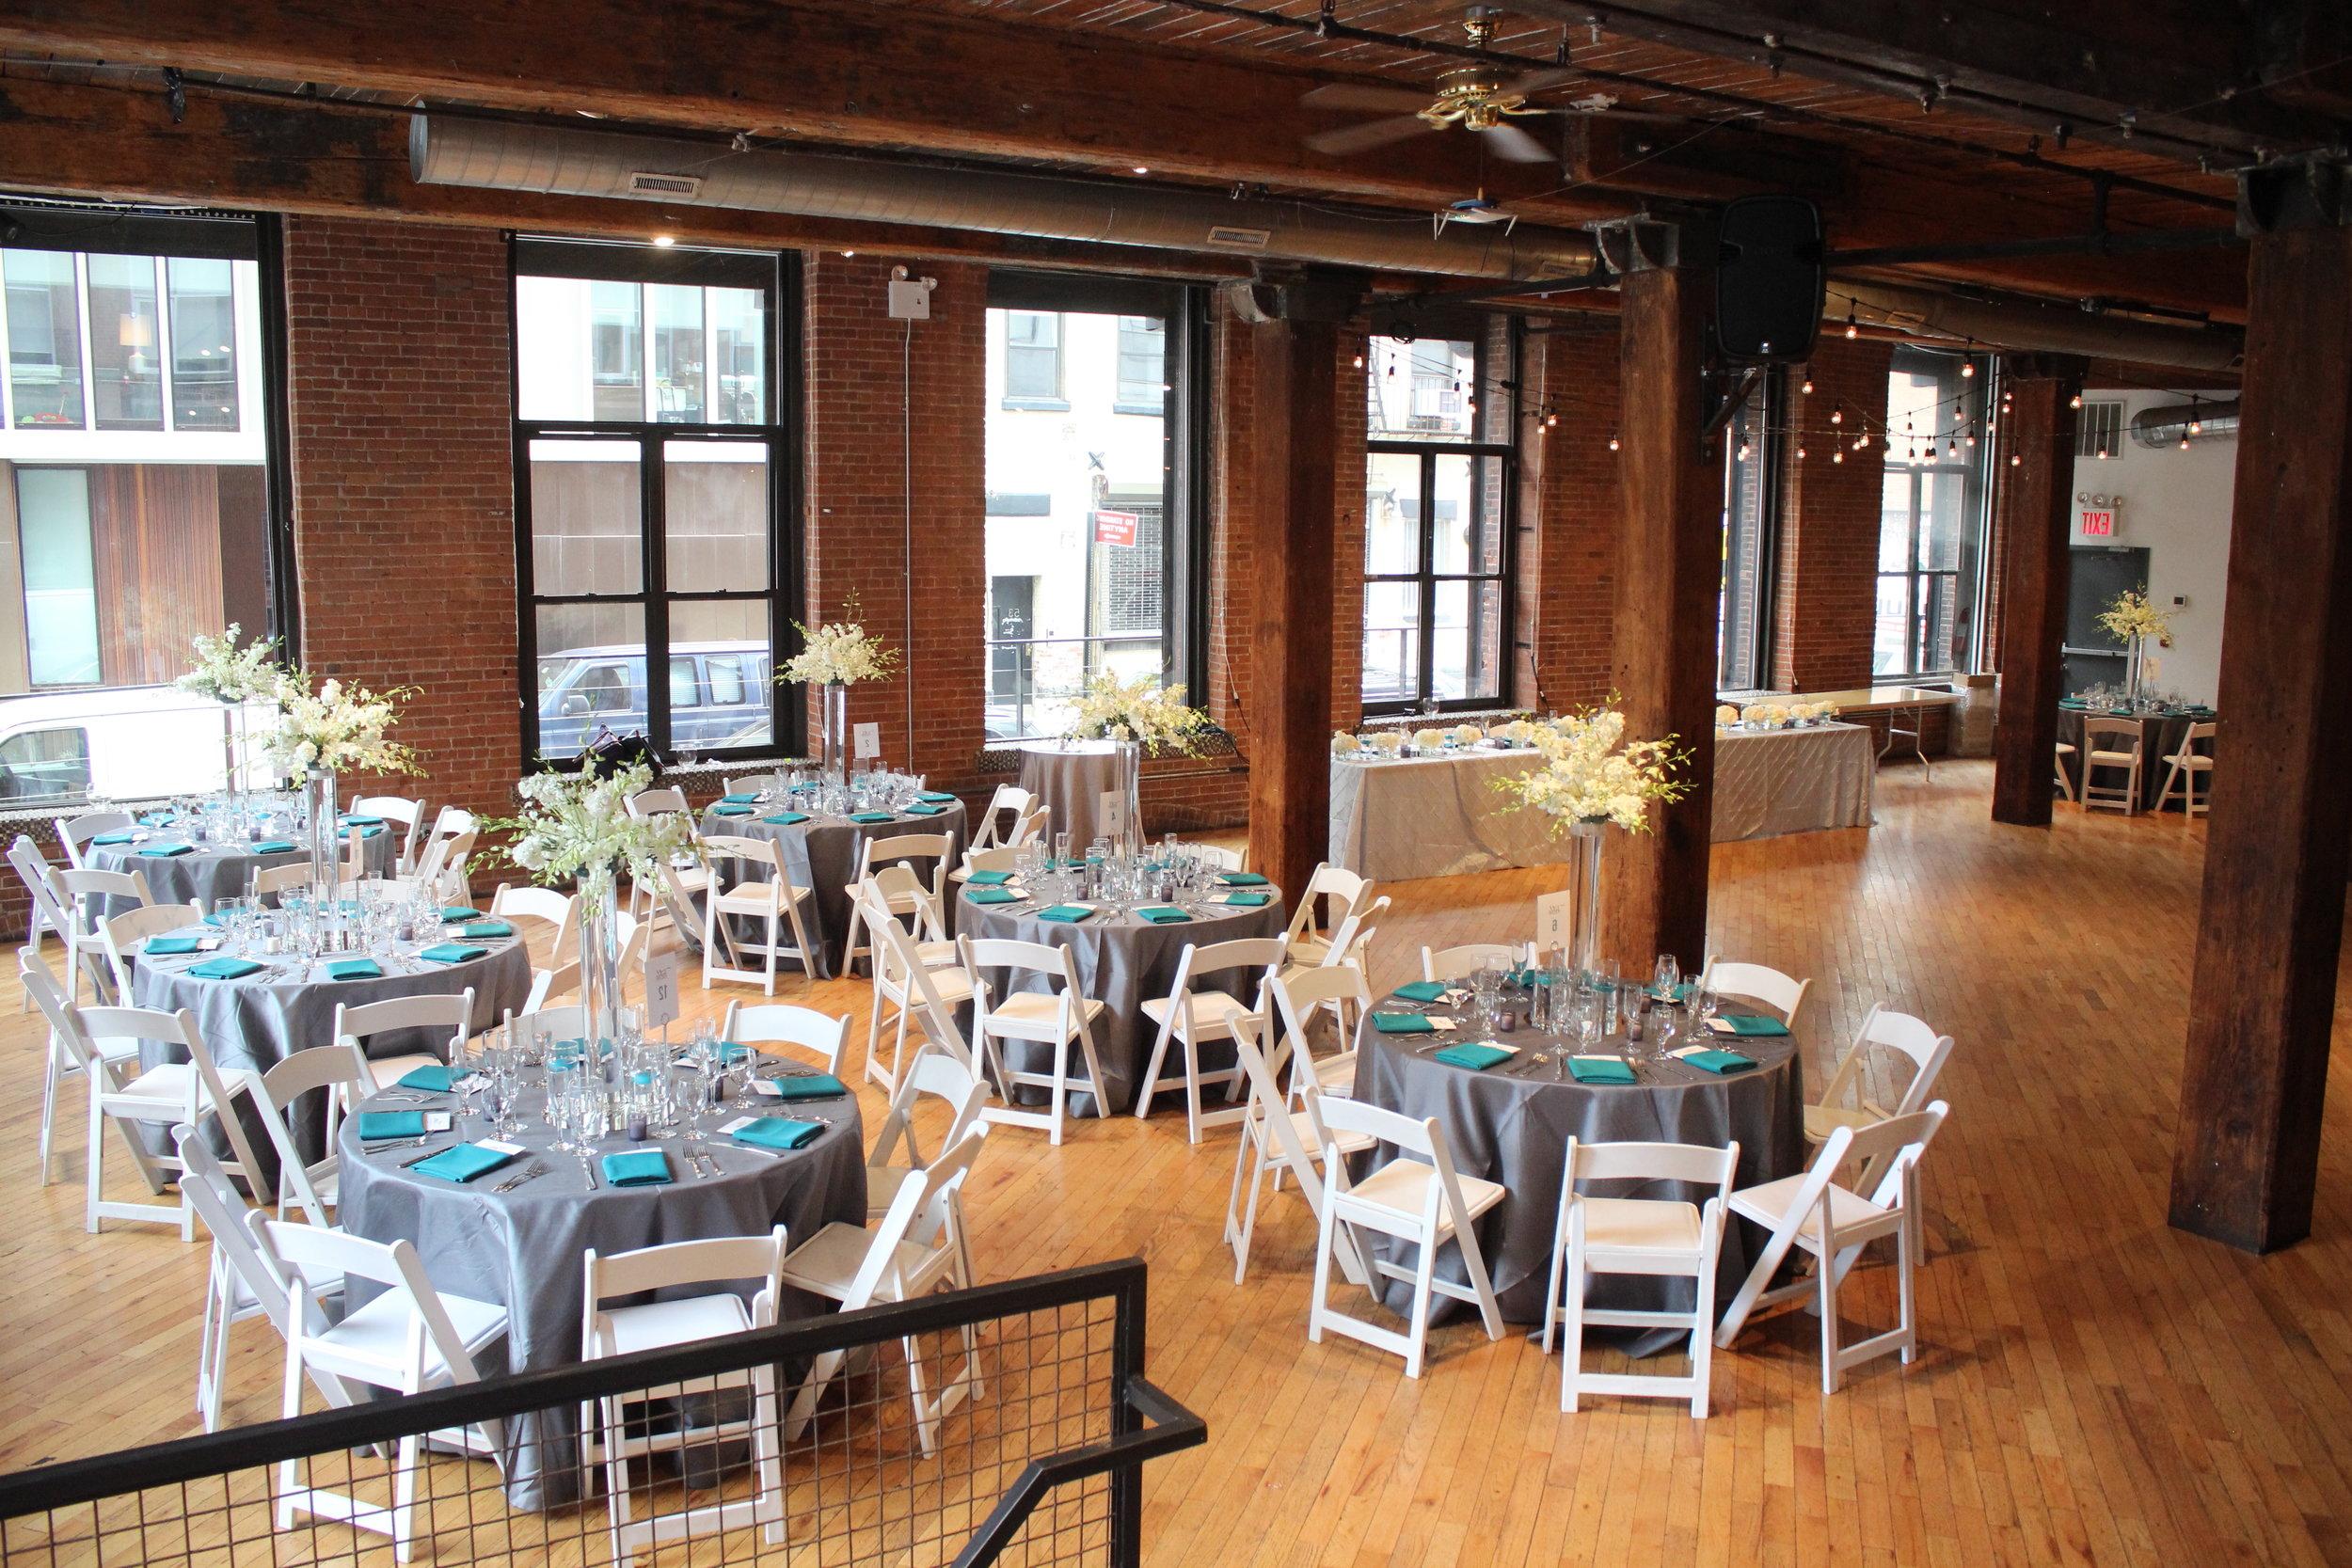 Teal & Grey Weddings Table Centerpieces